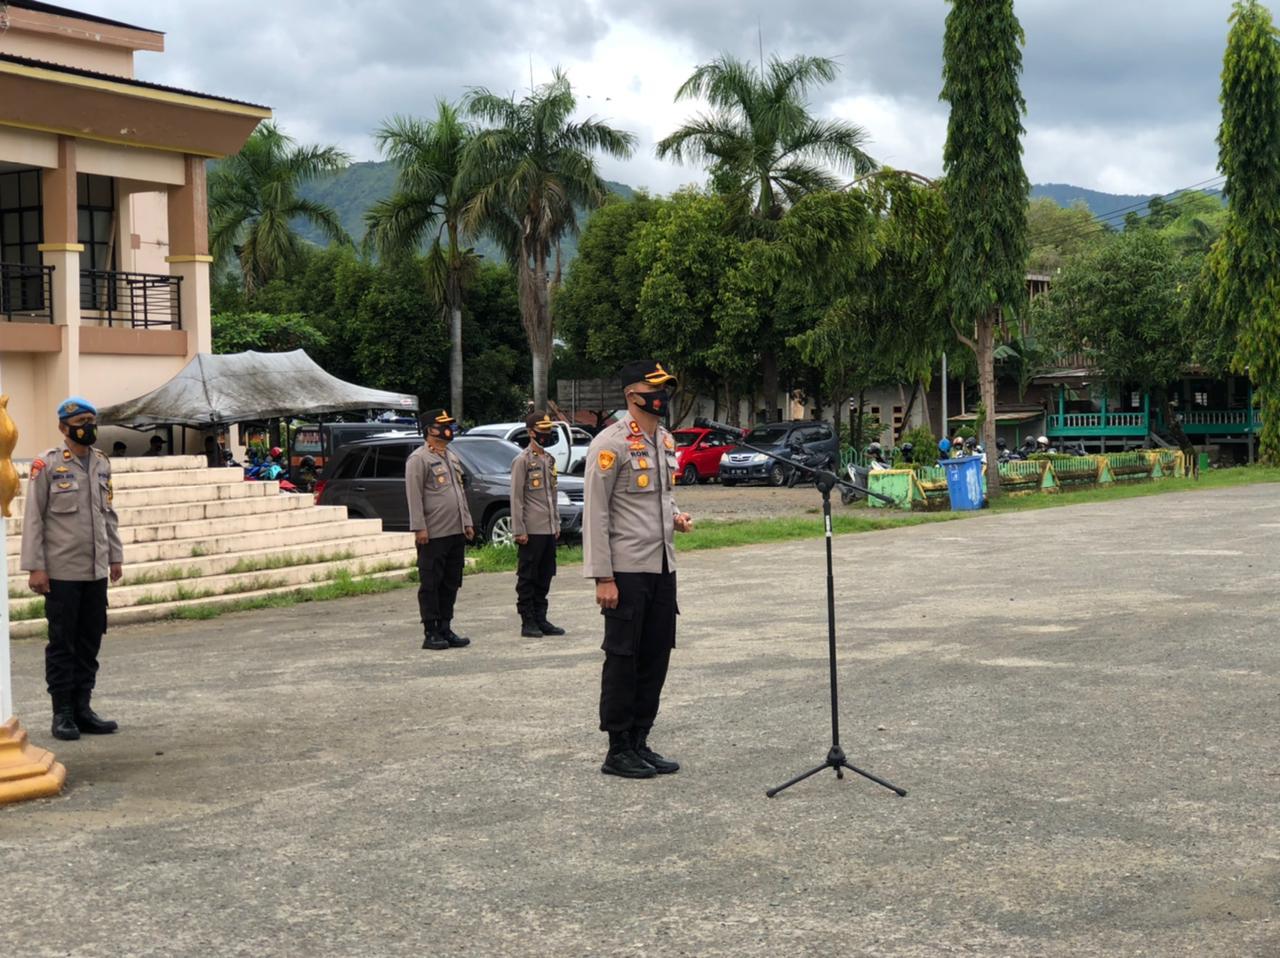 Kapolres Soppeng Berterima Kasih Kepada Personil yang Bantu Musibah Gempa di Mamuju